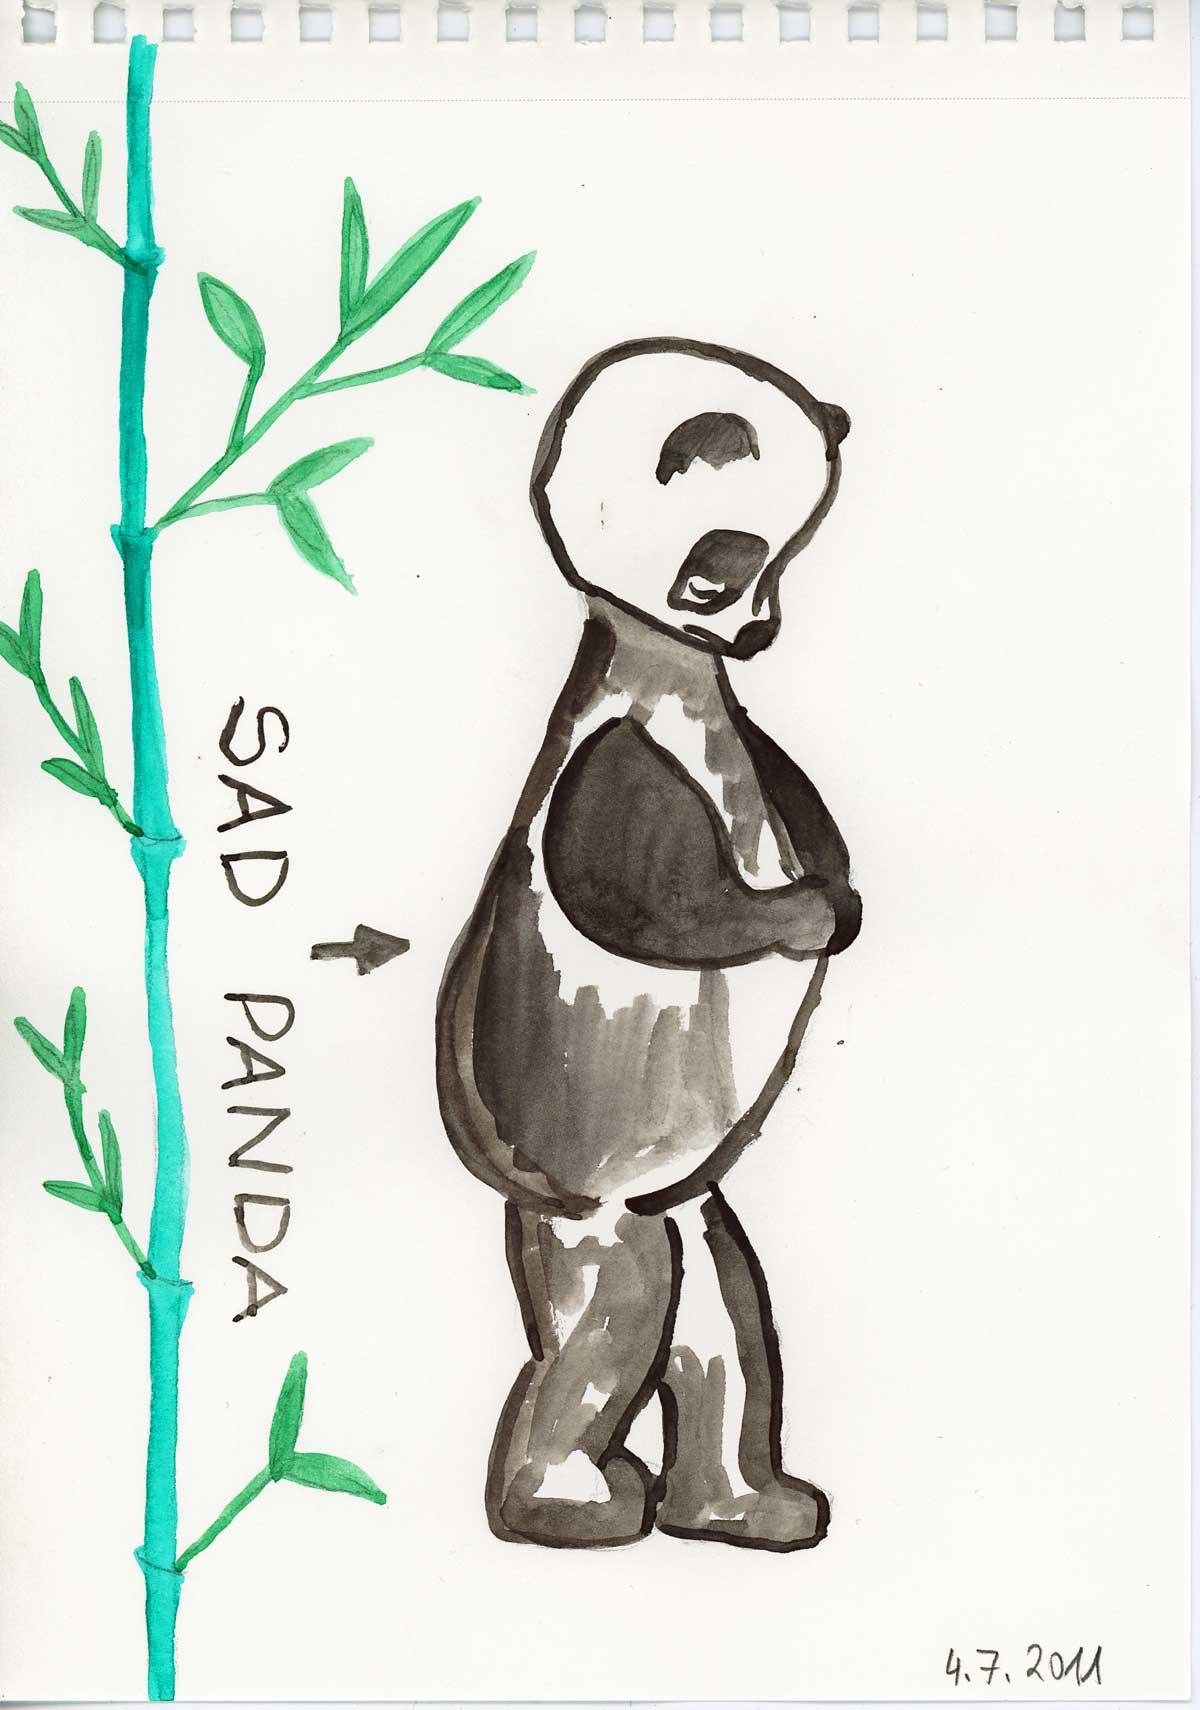 Be Creative #185 - Sad Panda, © Ines häufler, 2011